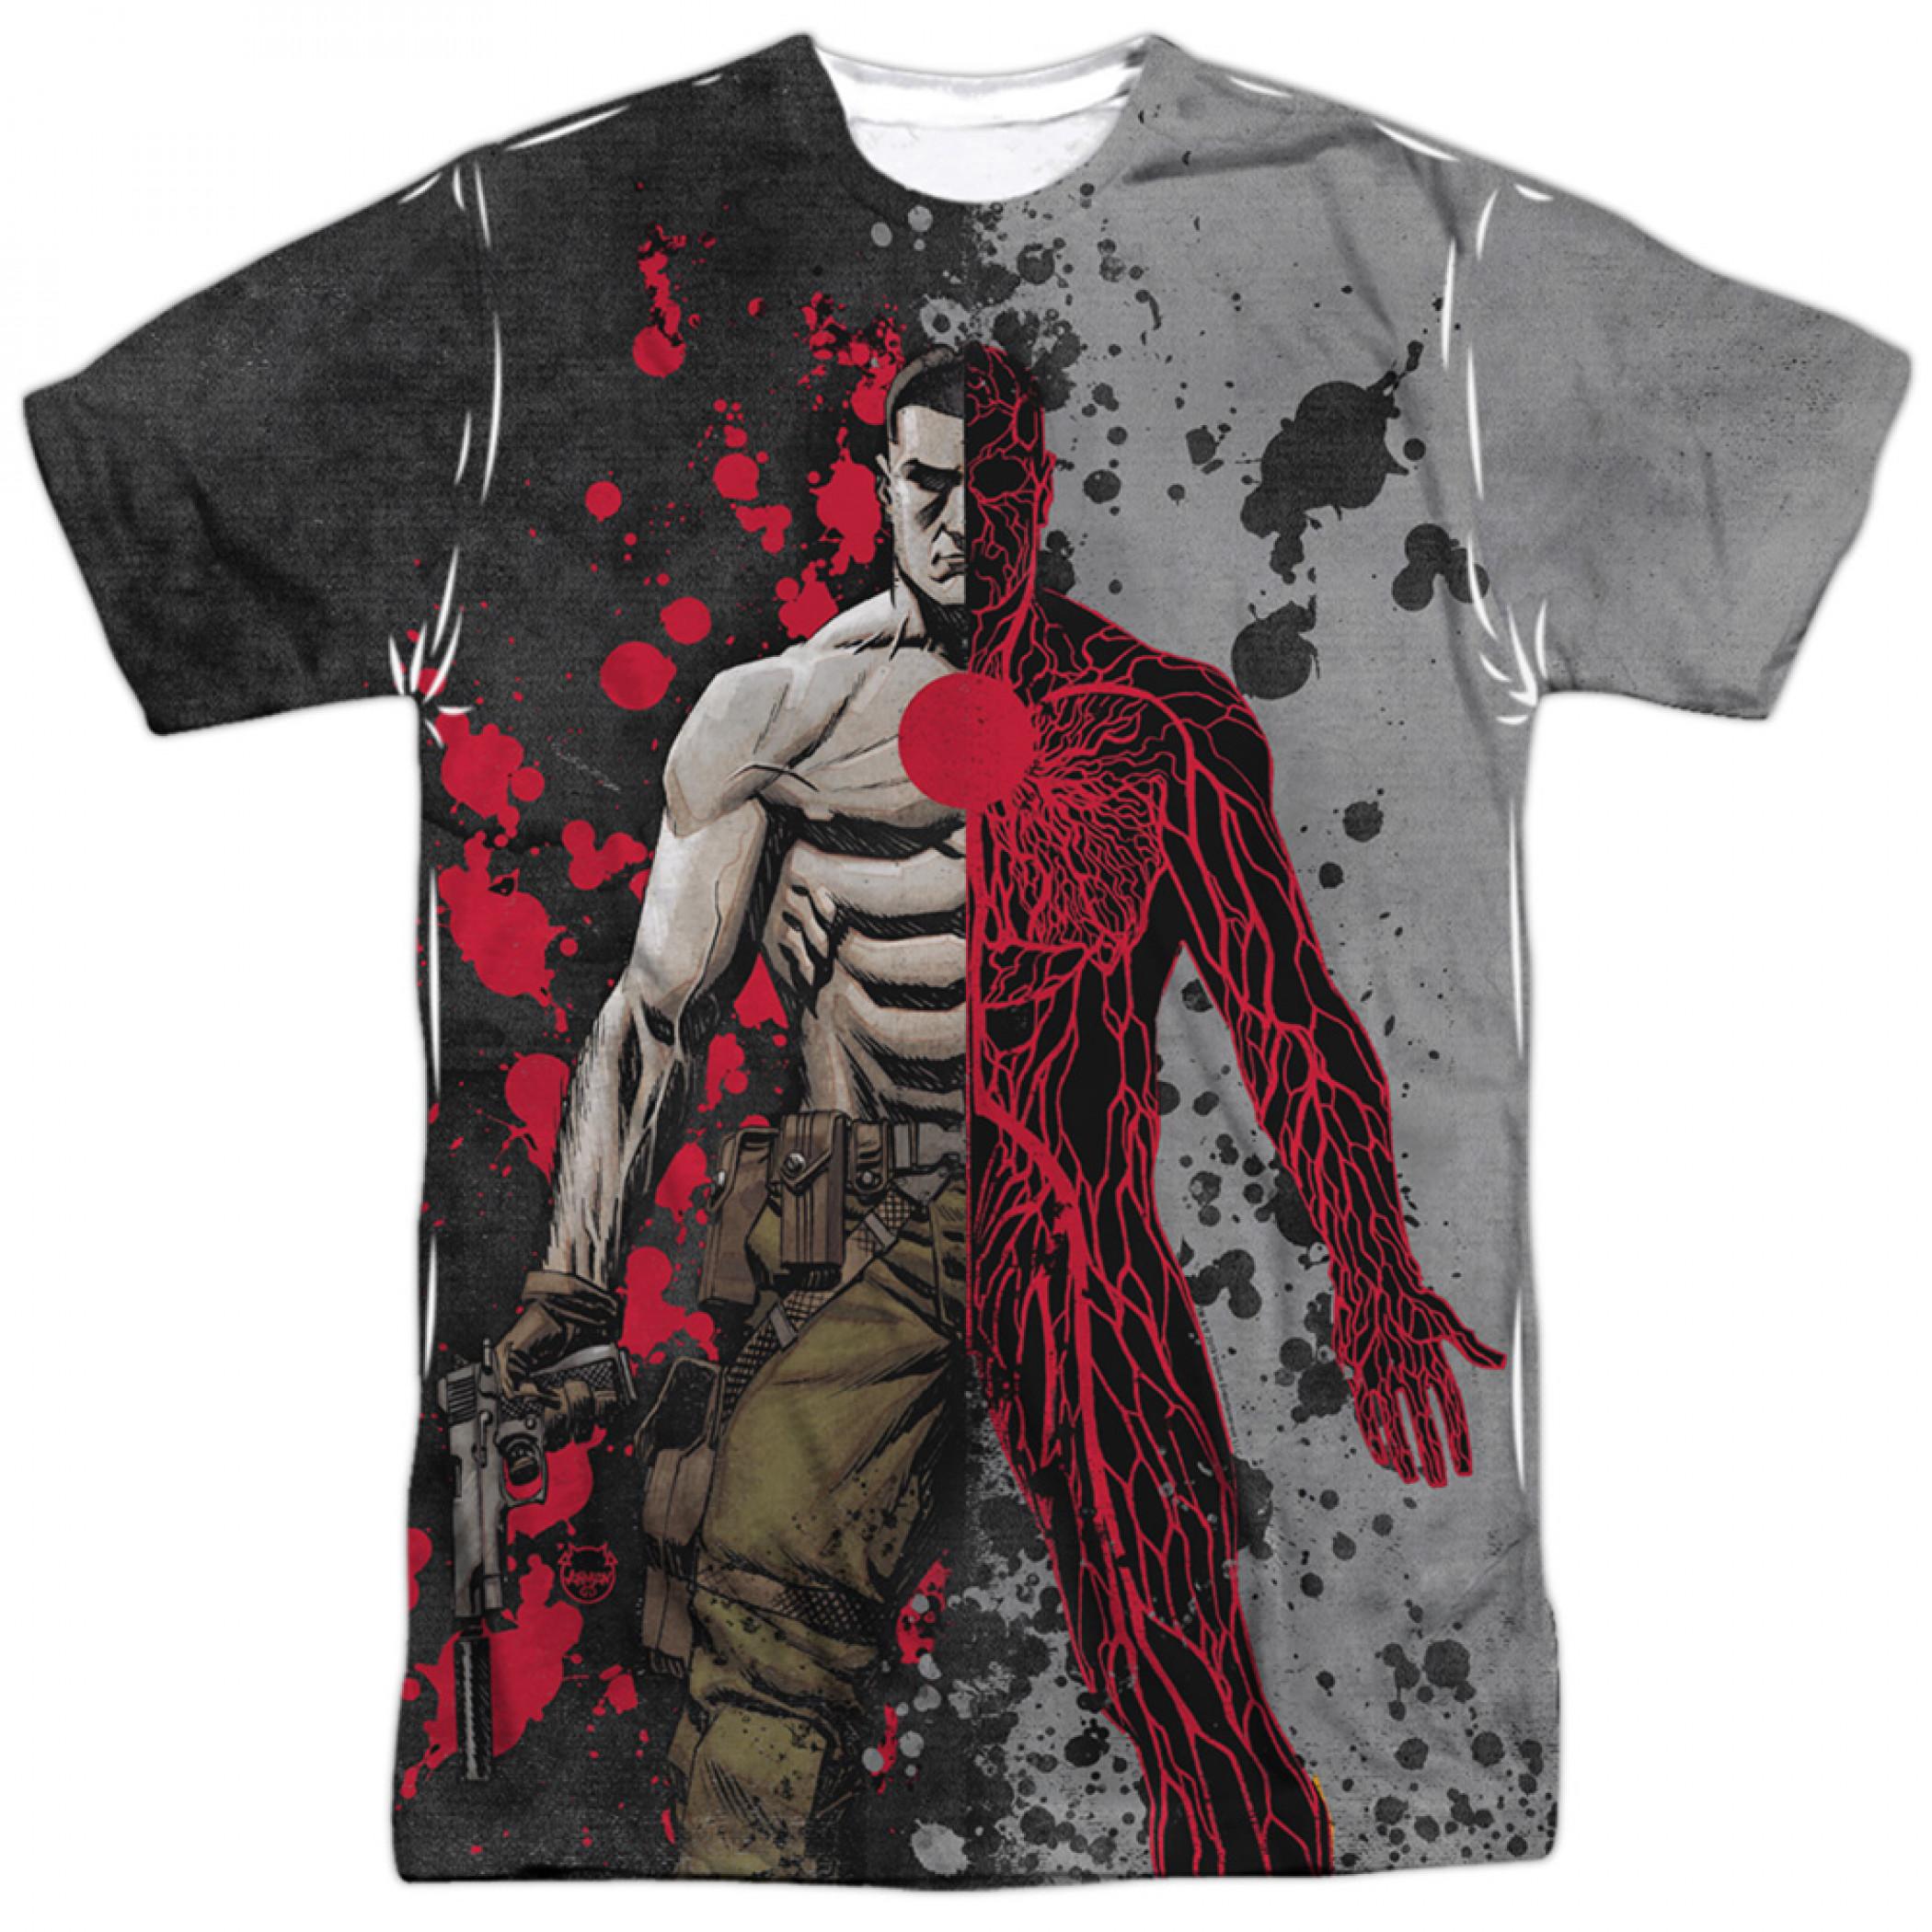 Bloodshot Split Veins Front and Back Print T-Shirt